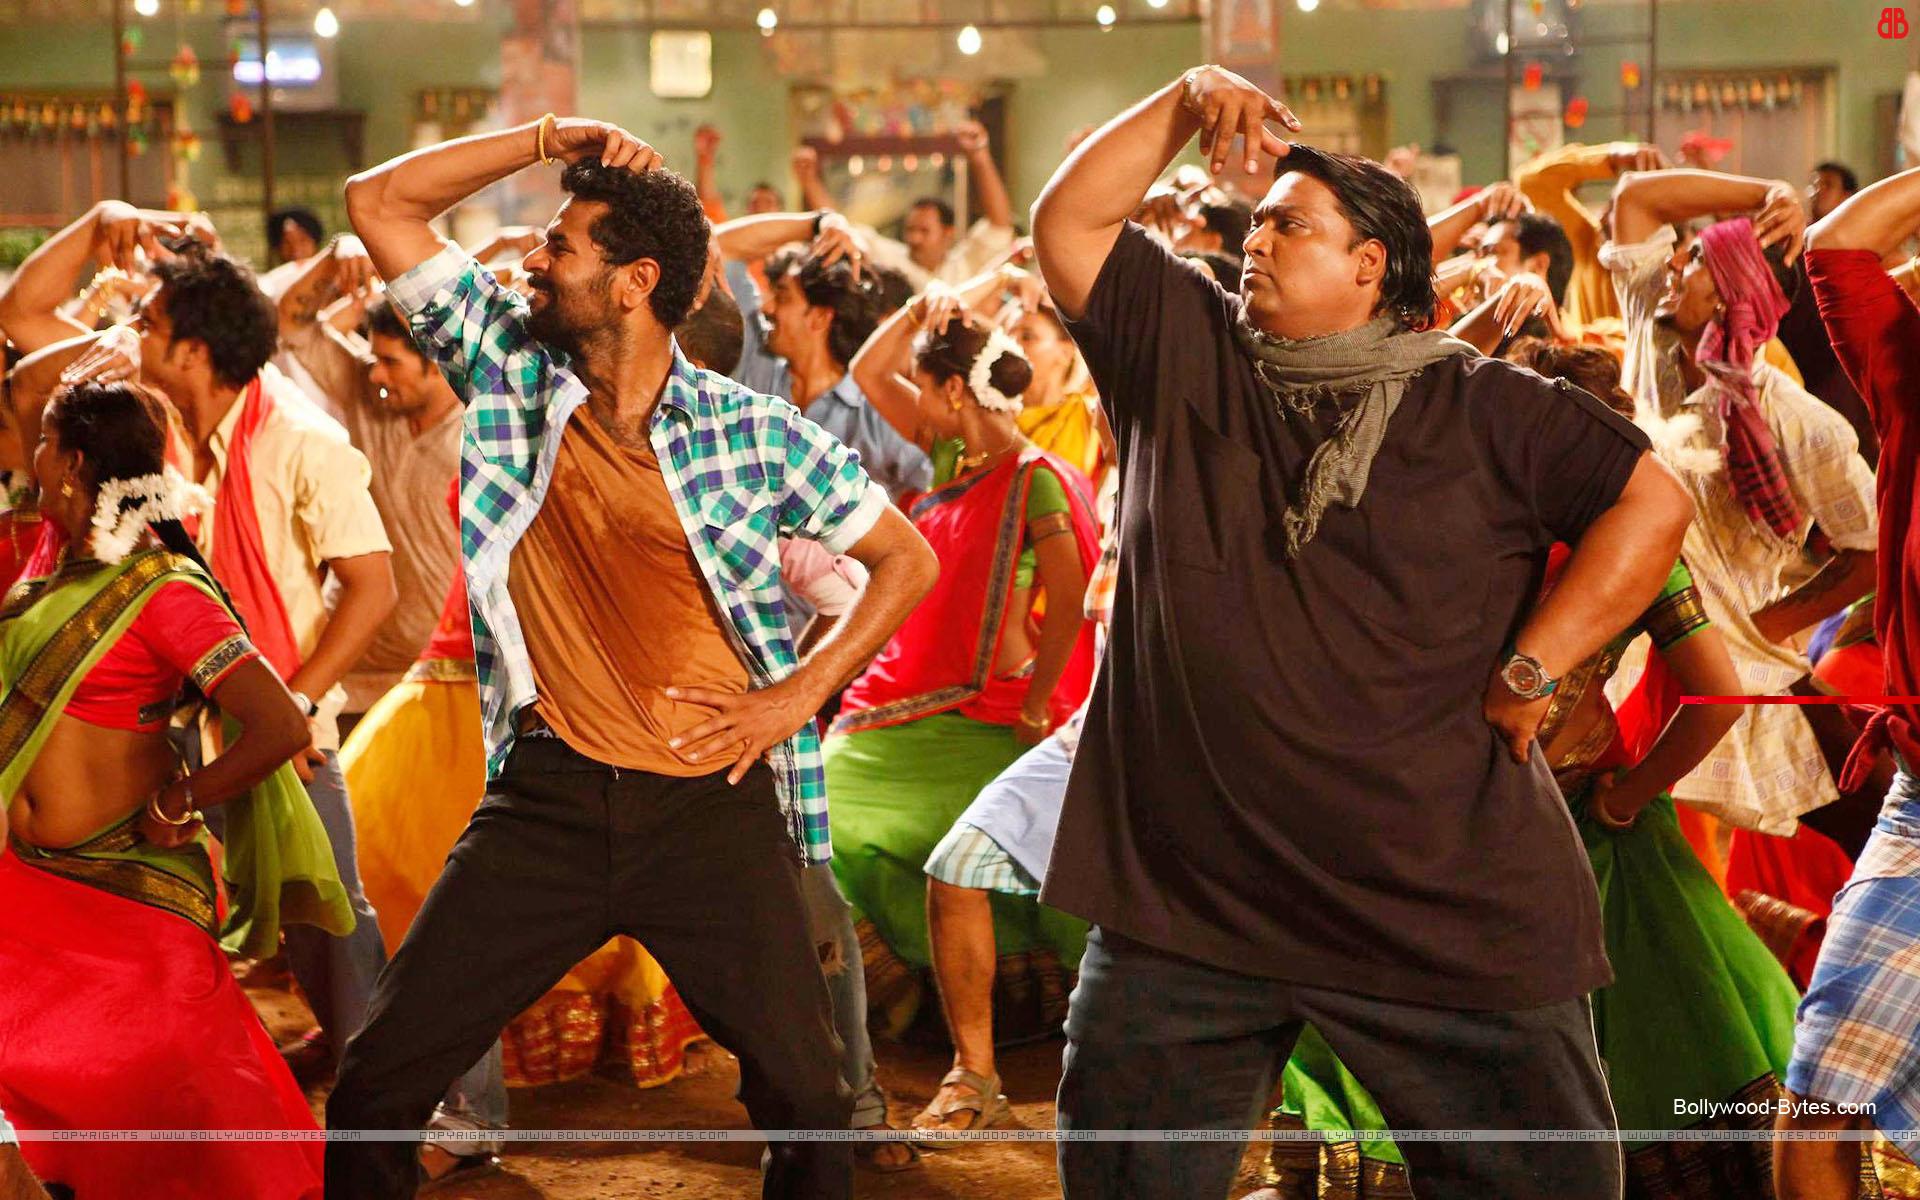 https://1.bp.blogspot.com/-I0QT36j6GWI/UP-lGj_lWPI/AAAAAAAAZlM/ykN9jRyJWYI/s1920/ABCD-Any-Body-Can-Dance-++Prabhudeva-Ganesh-Acharya-HD-Wallpaper-08.jpg